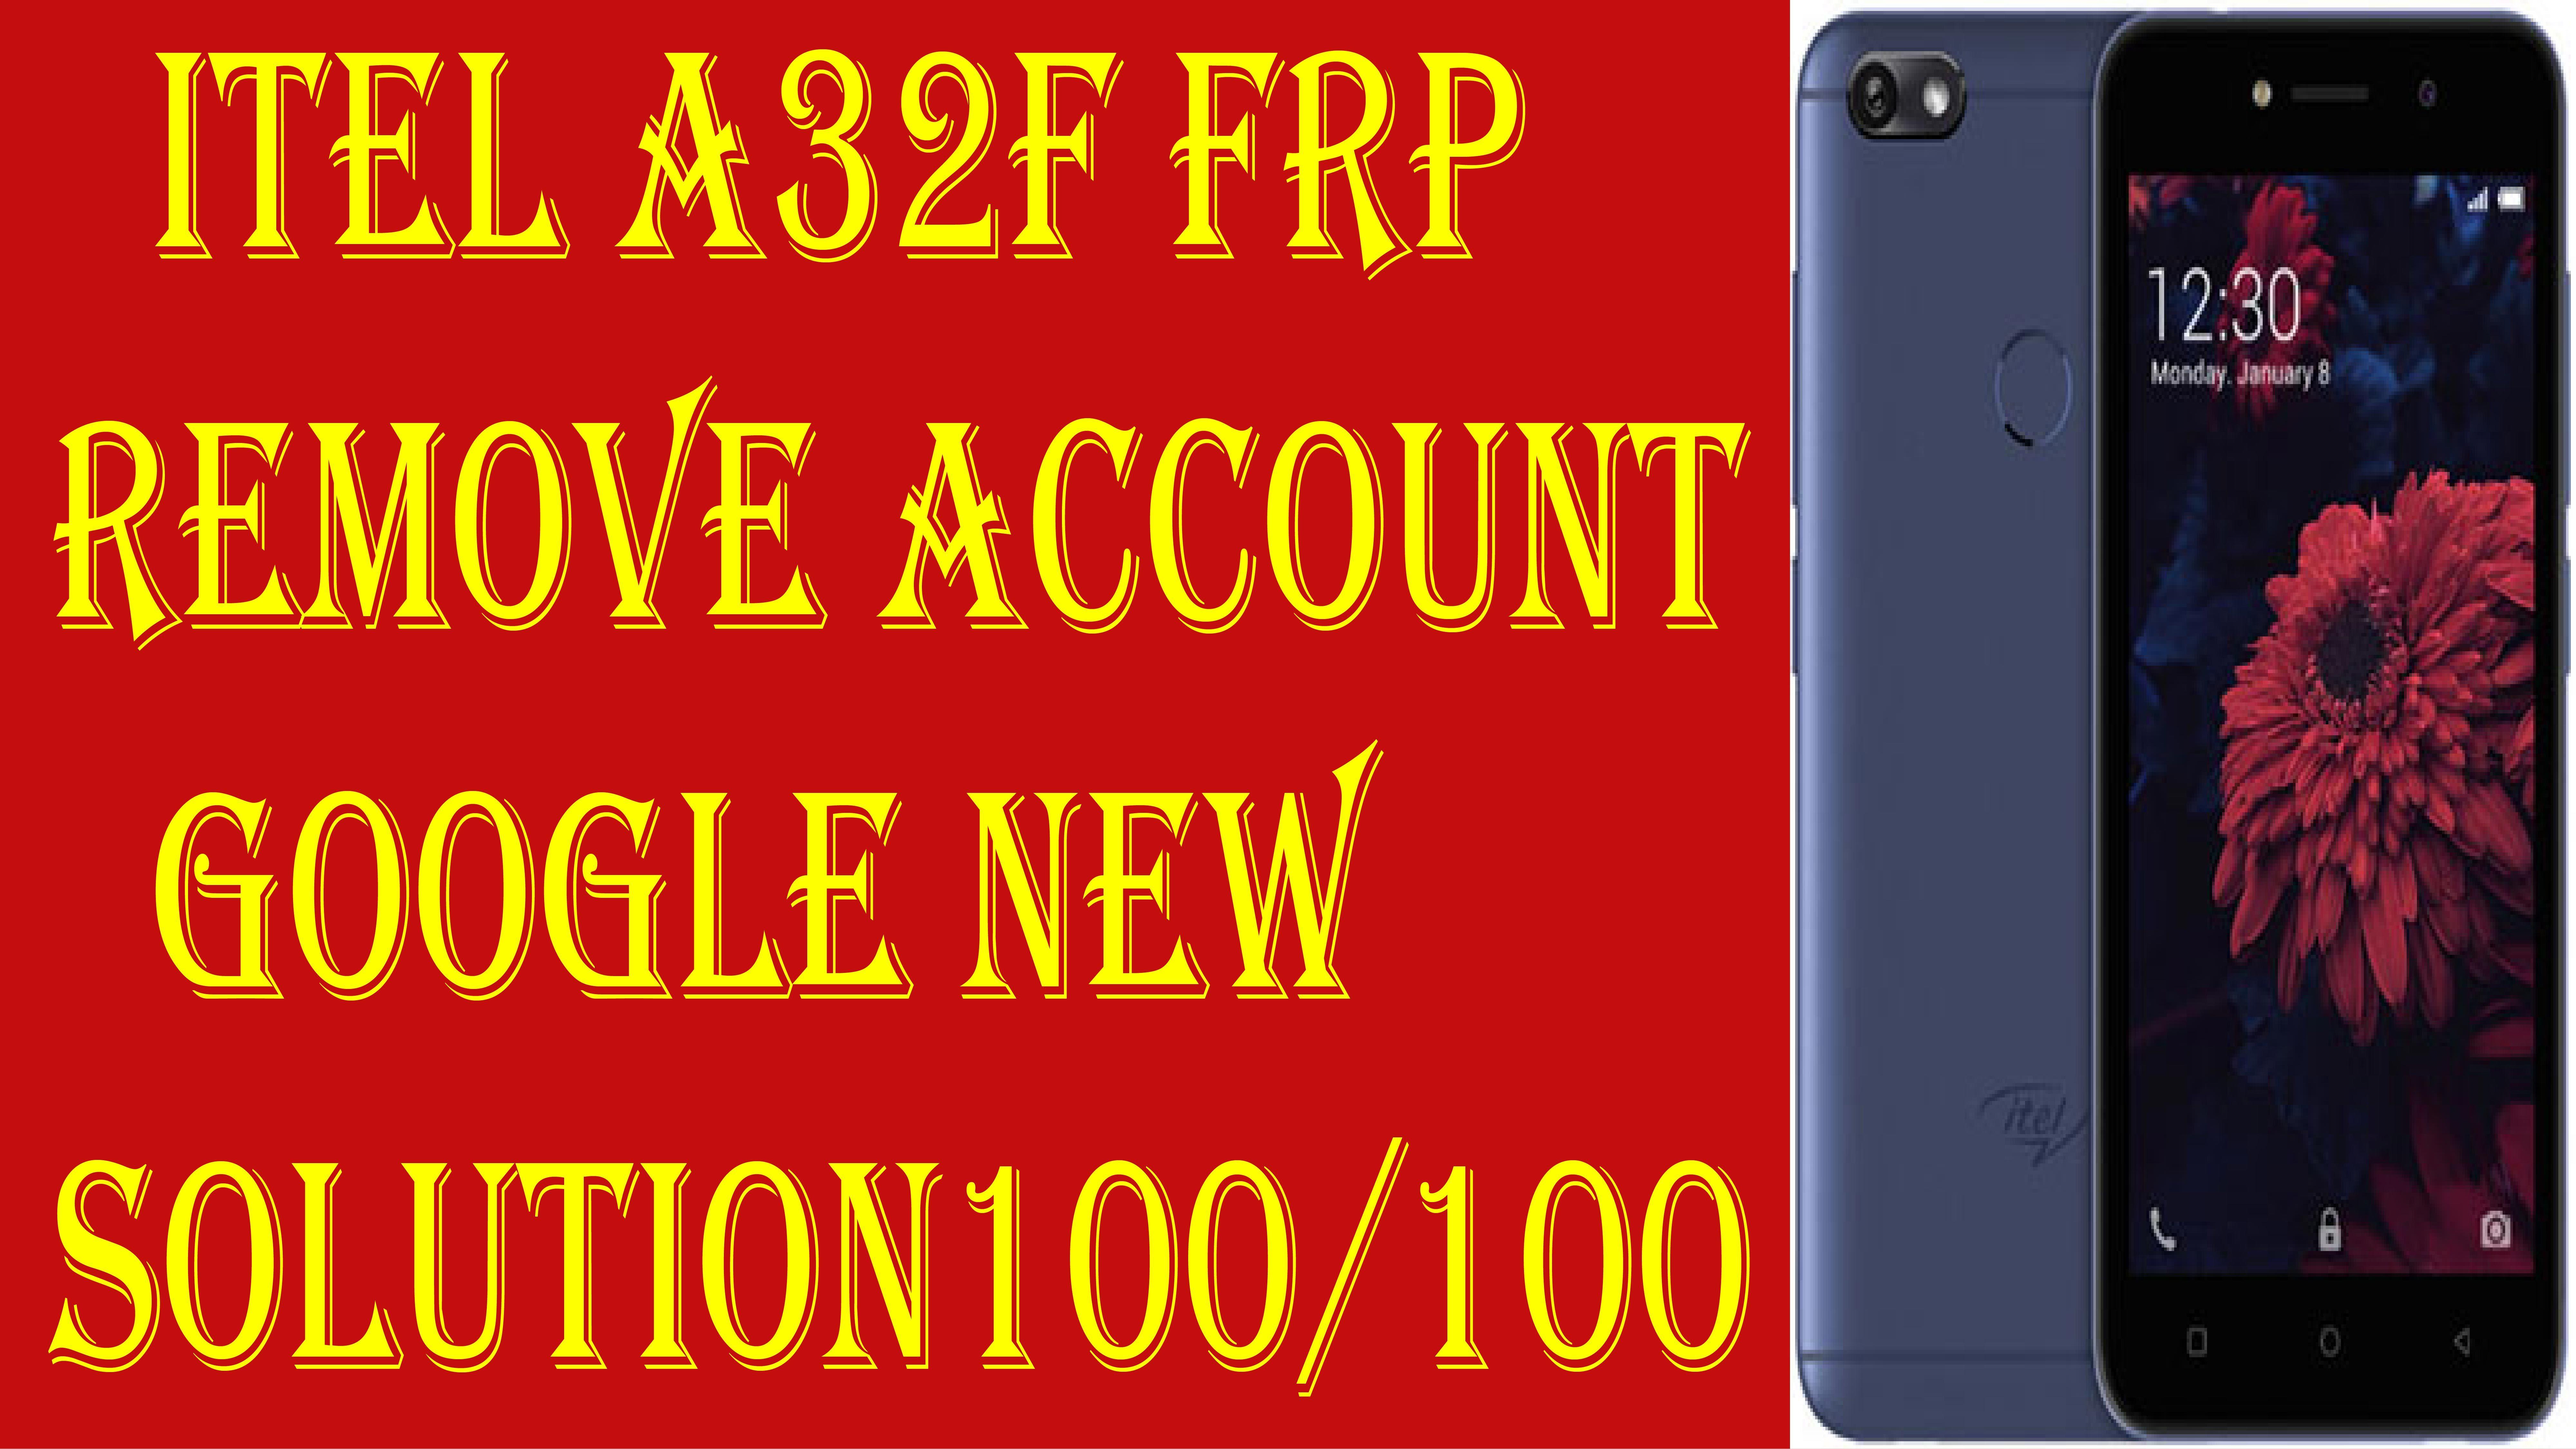 itel a32f frp remove account google new solution 100/100